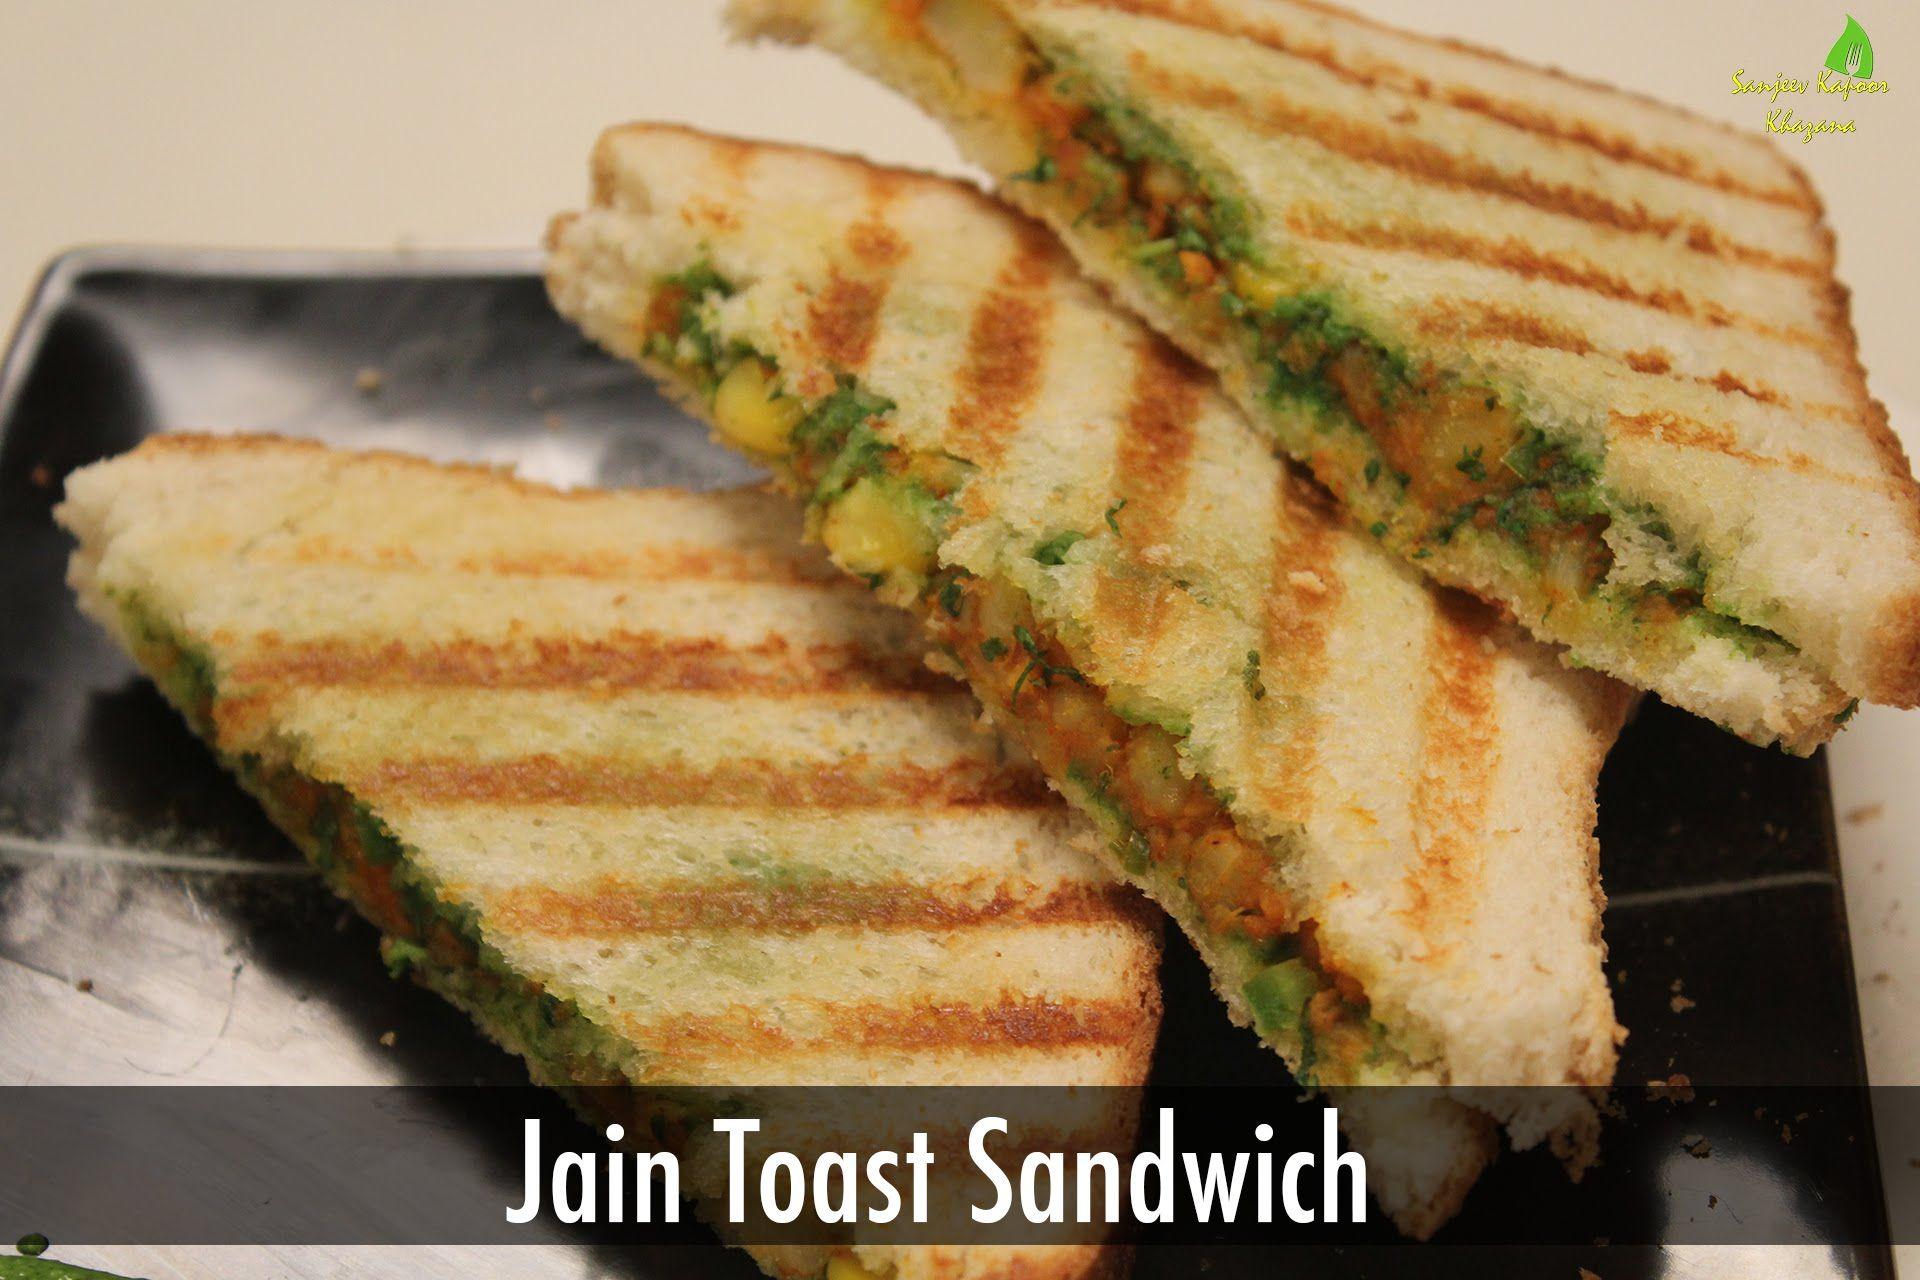 Jain toast sandwich jain cuisine sanjeev kapoors khana khazana jain toast sandwich jain cuisine sanjeev kapoors khana khazana forumfinder Choice Image